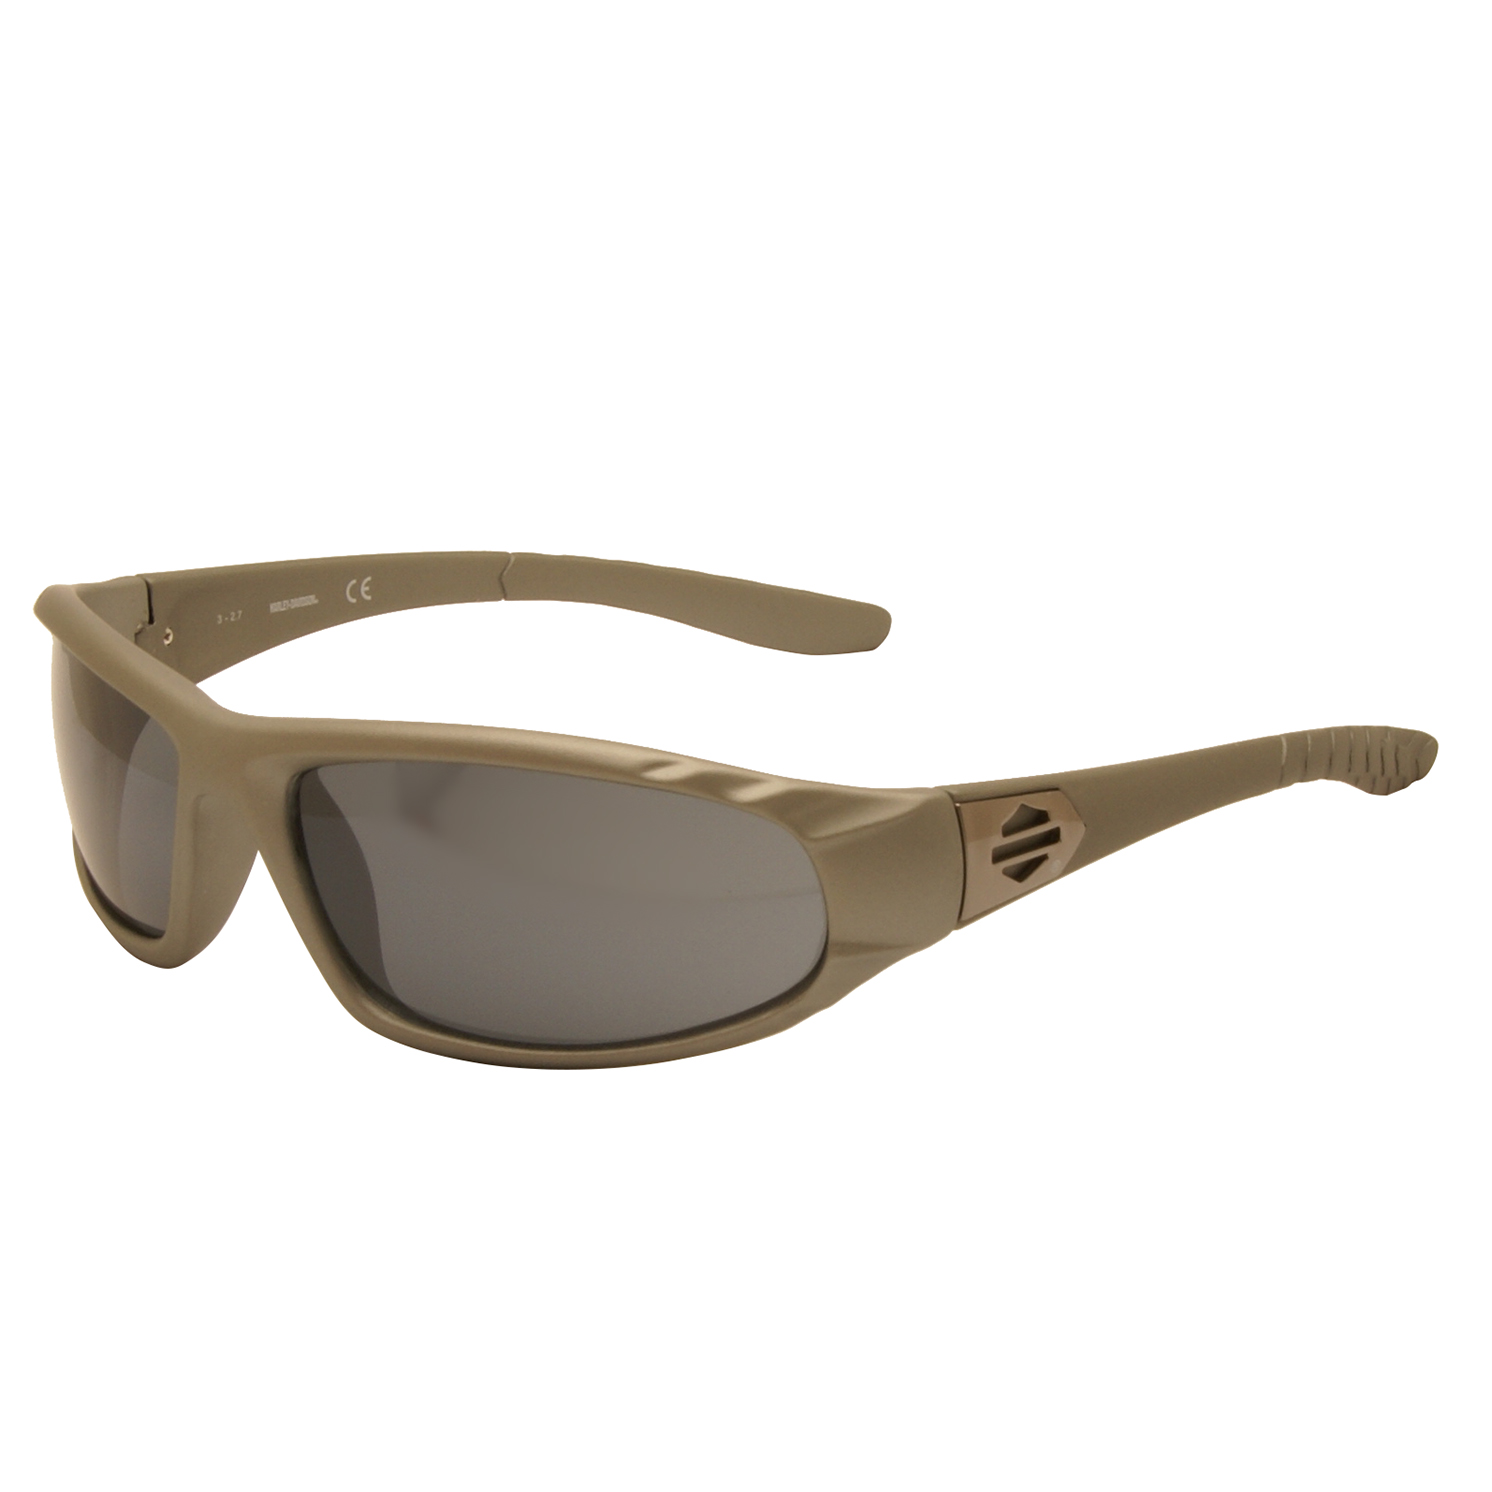 Harley Davidson – Satin Grey Wraparound Style Sunglasses with Case